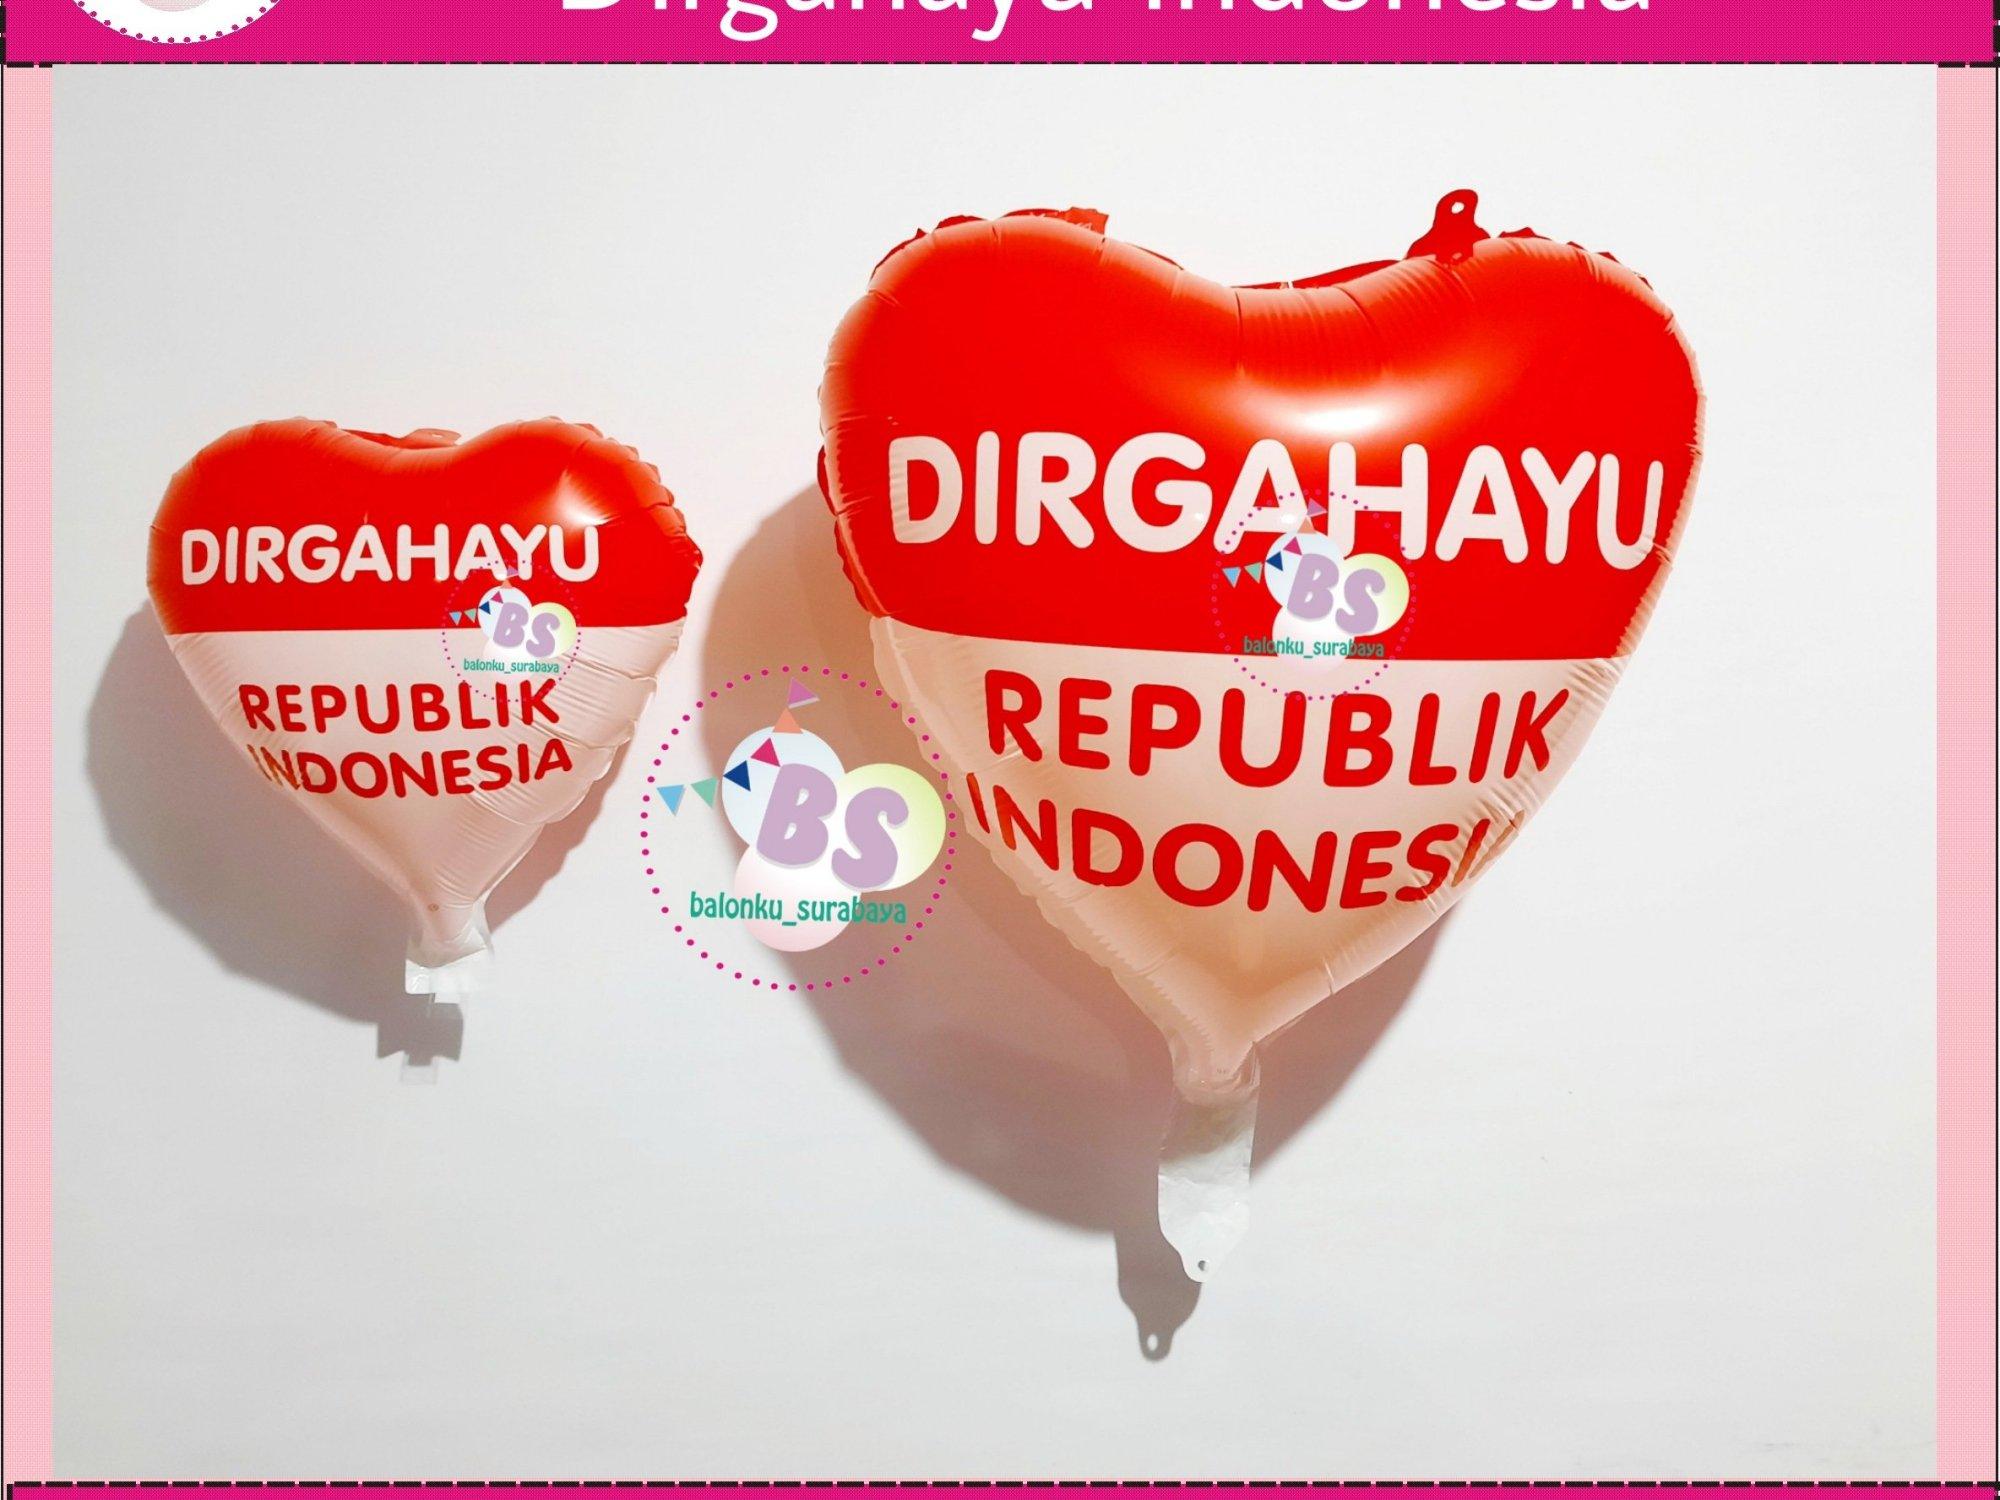 balon dirgahayu indonesia love, balon dirgahayu indonesia bulat, tulisan dinding dirgahayu indonesia, garland balon, parcel balon ucapan, parcel balon ucapan, parcel balon ucapan warna pink, balon bentuk bunga, standing balon custom, balon ucapan ulang tahun anak, balon ucapan ulang tahun warna merah, balon ucapan ulang tahun merah, balon ucapan ulang tahun anak balon ucapan warna peach, baln ucapan box coklat, jual balon latex twist hijau emerald, BAlon Gas,Bunga dekorasi,Rangkaian bunga artificial, Buket bunga, buket bunga mawar, harga buket bunga,Balon sablon, balon Printing, balon promosi, Perlengkapan ulang tahun, Balon latex , balon doff, balon natal, balon agustusan, balon dekorasi, balonku Surabaya, 085733133529